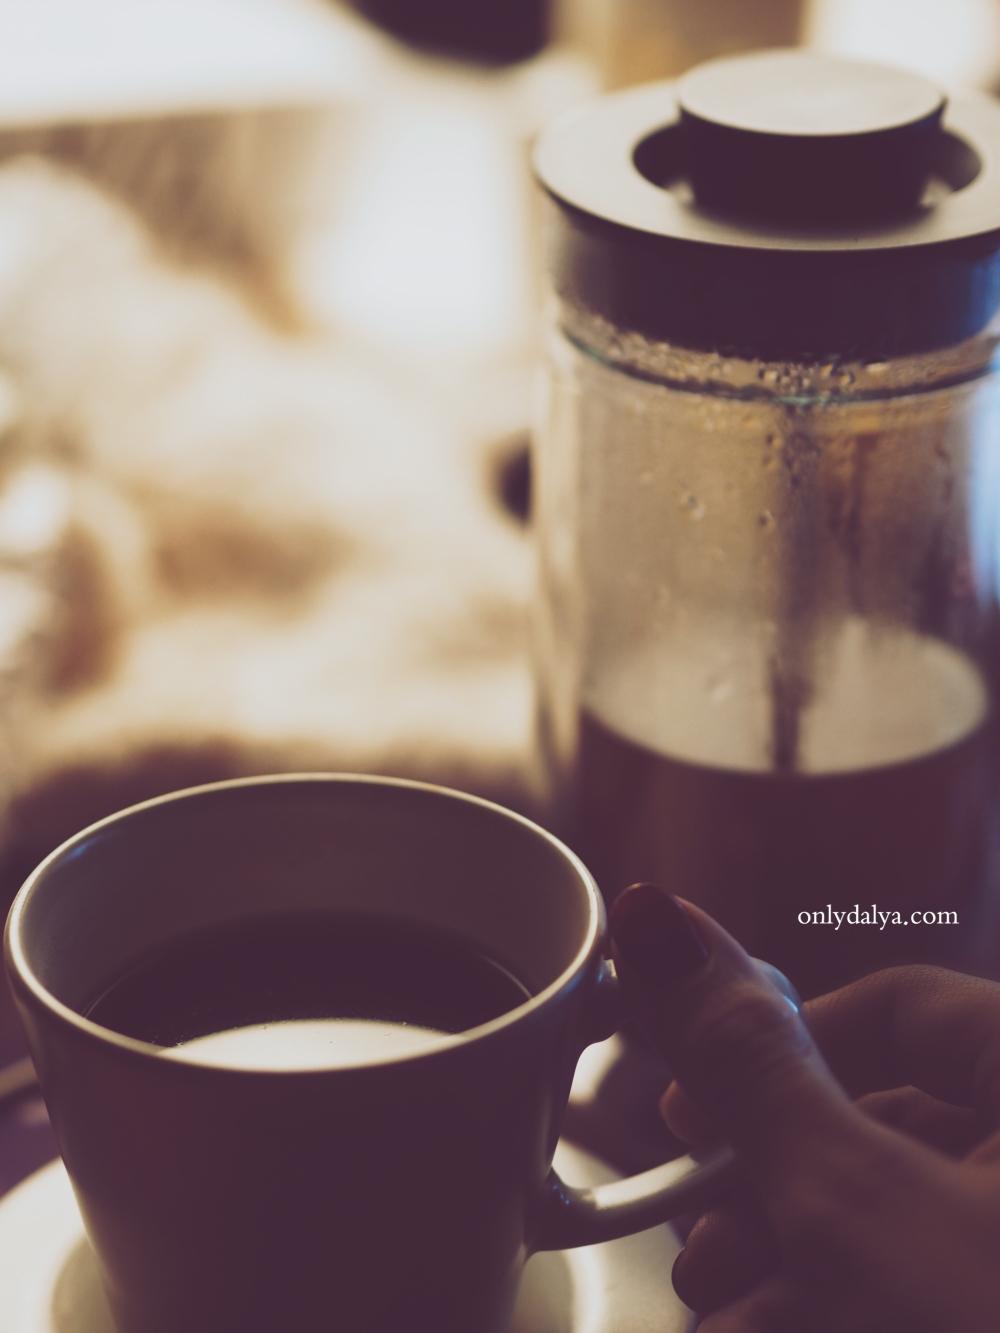 coffee , night , قهوة ، ليل، شتا ، حب ، امراه ، يد ،